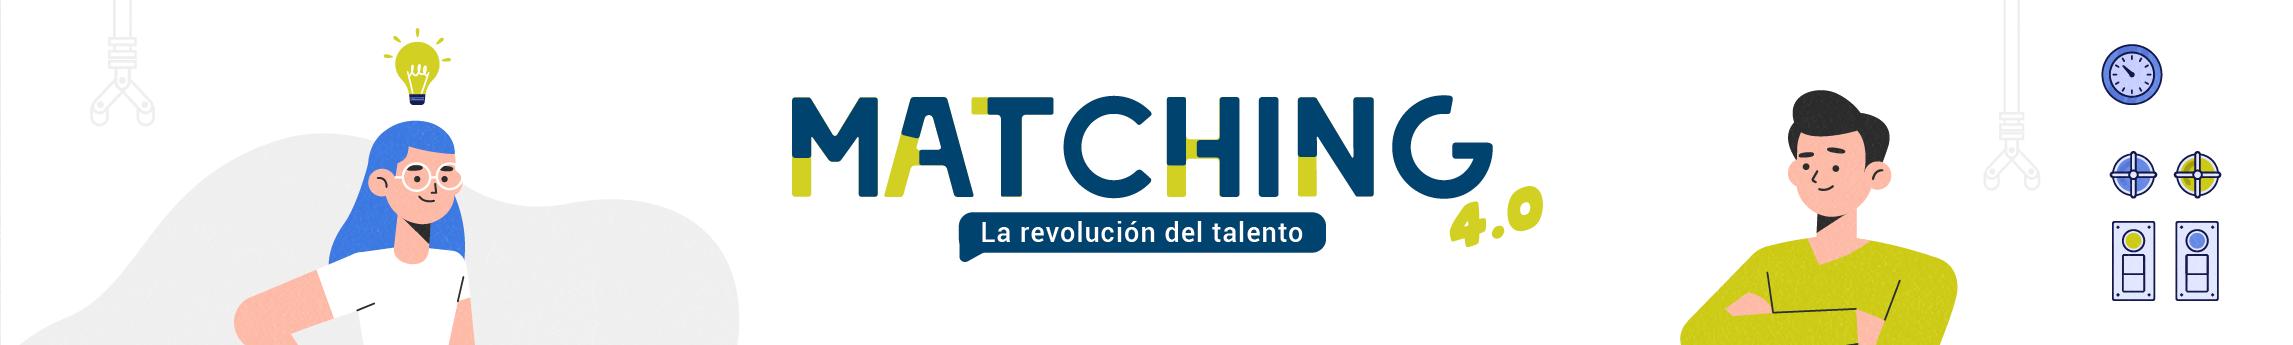 banner-matching-4.0-micrositio